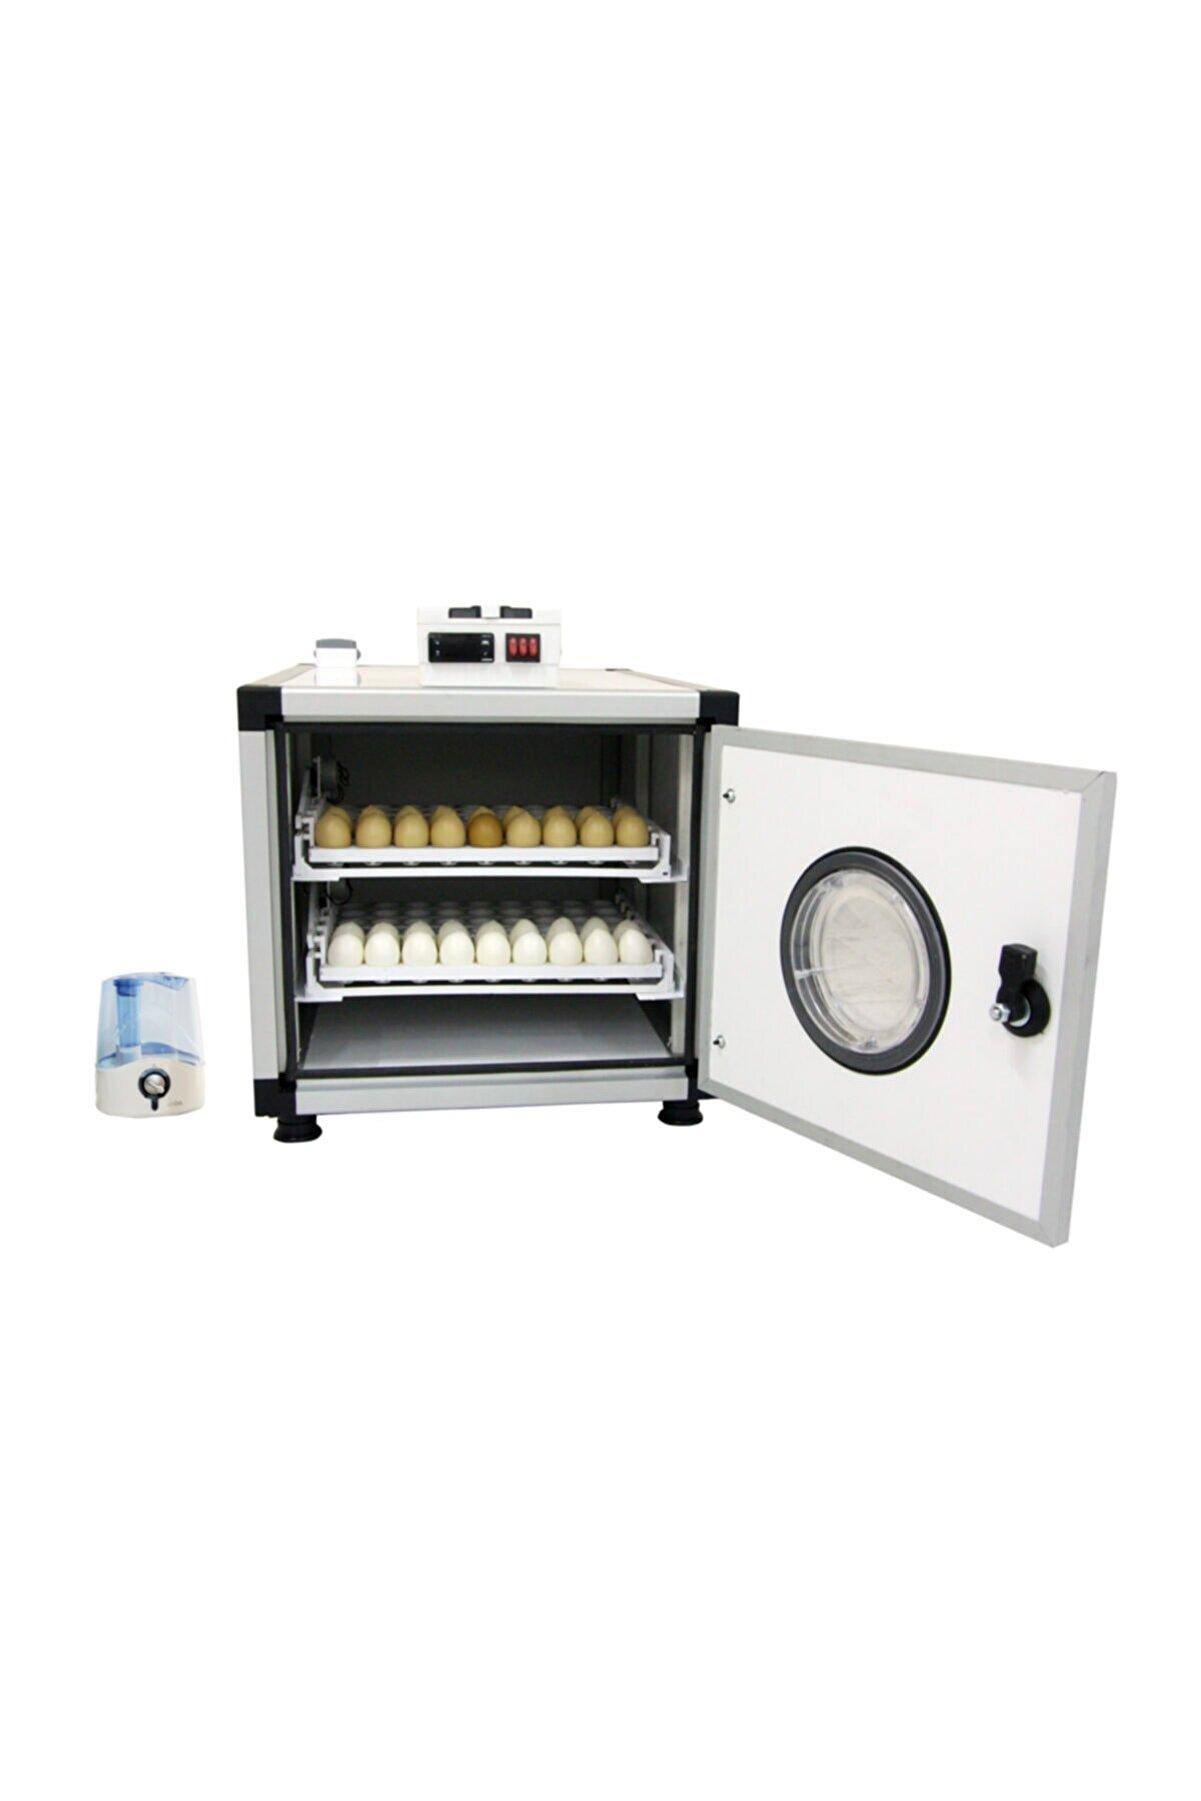 chickbox Kuluçka Makinesi 126 Lık Tam Otomatik